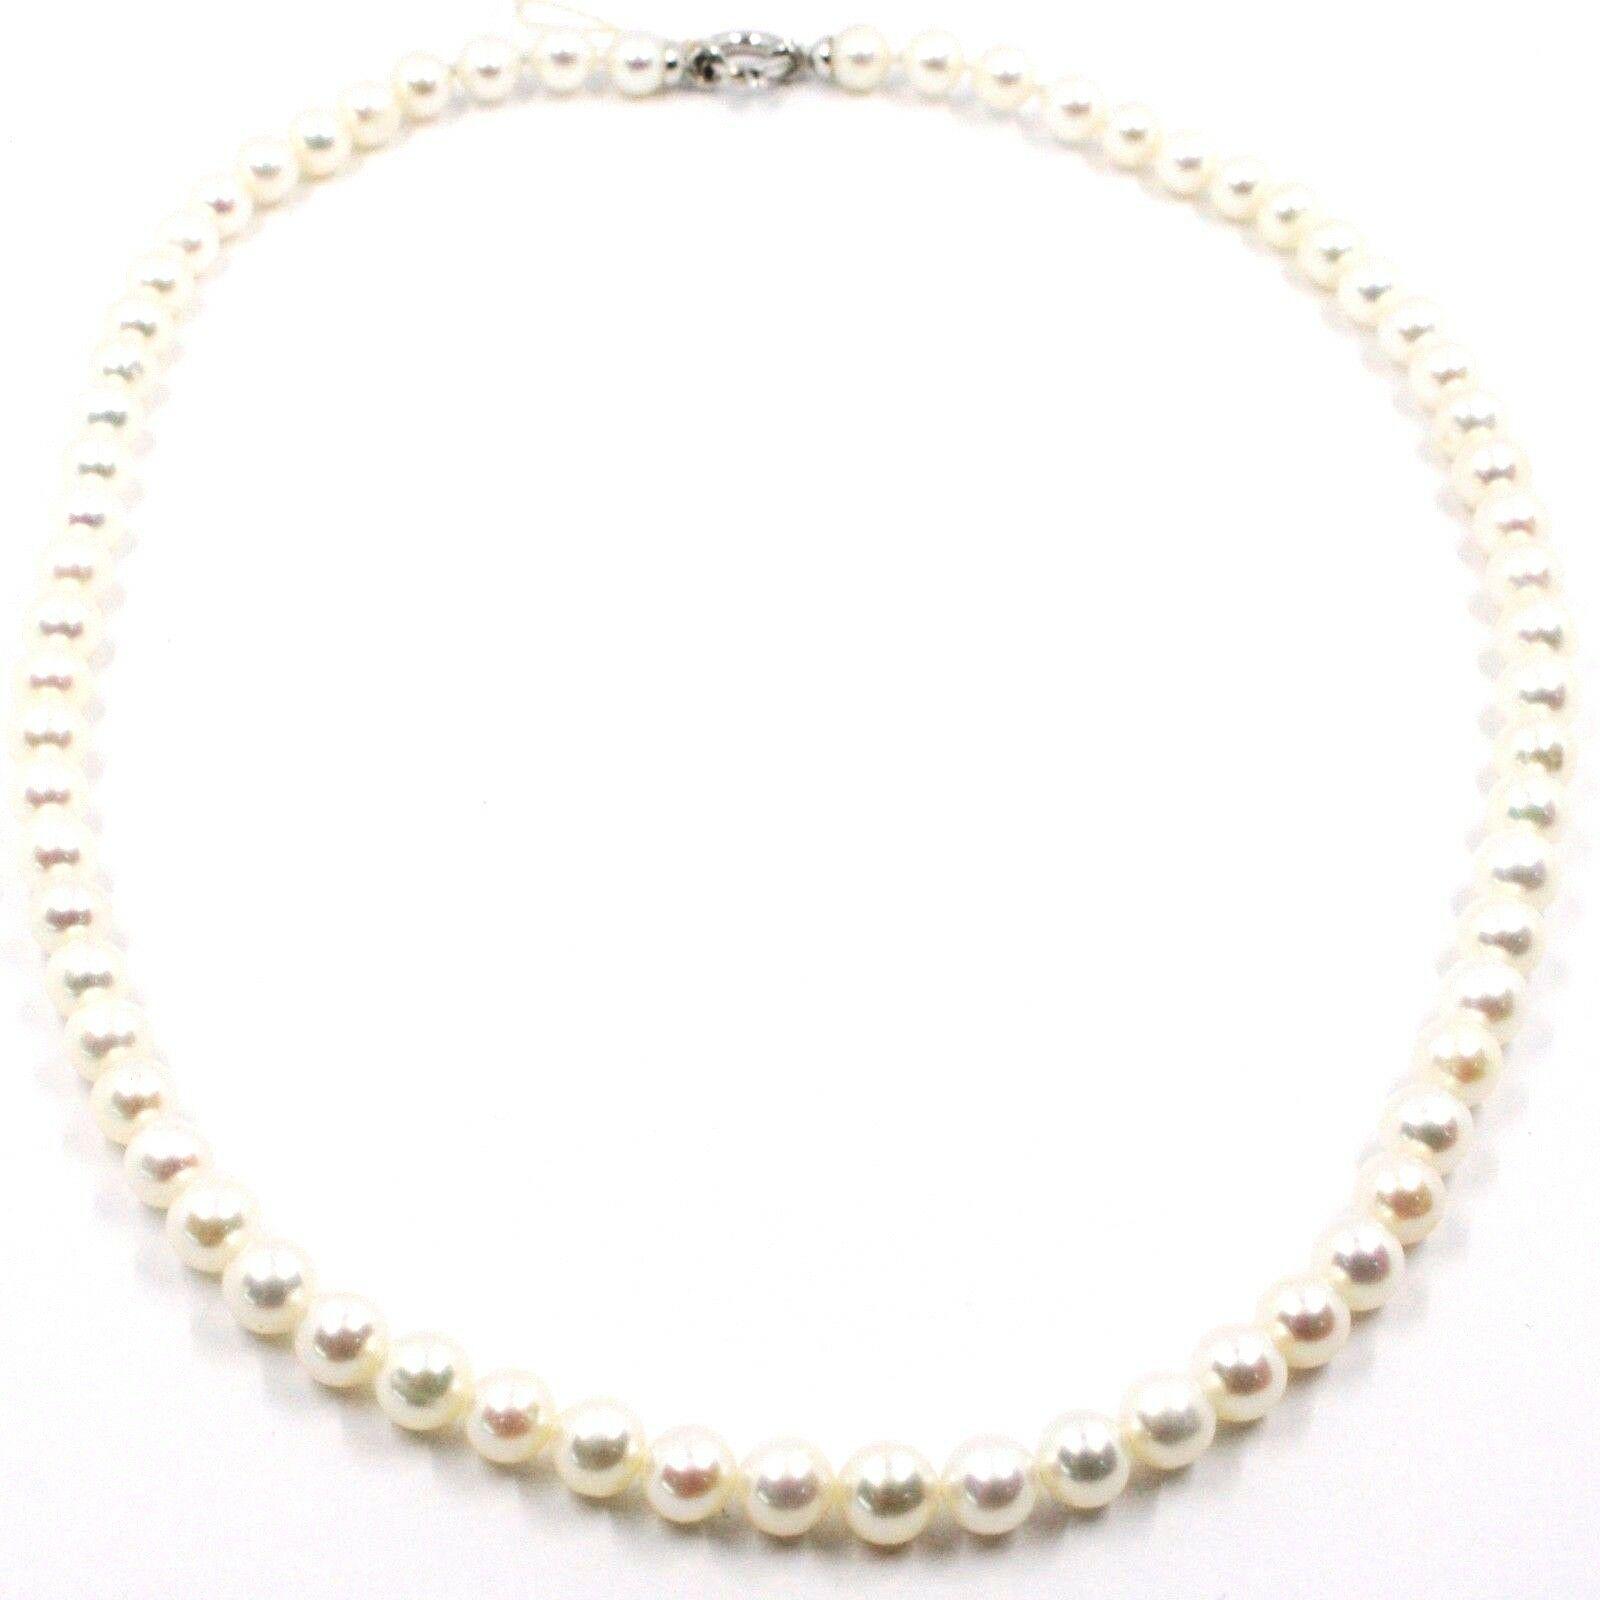 Collier, Fermoir or Blanc 18K, Perles Blanches 6-6.5 mm, 42 49 55 CM